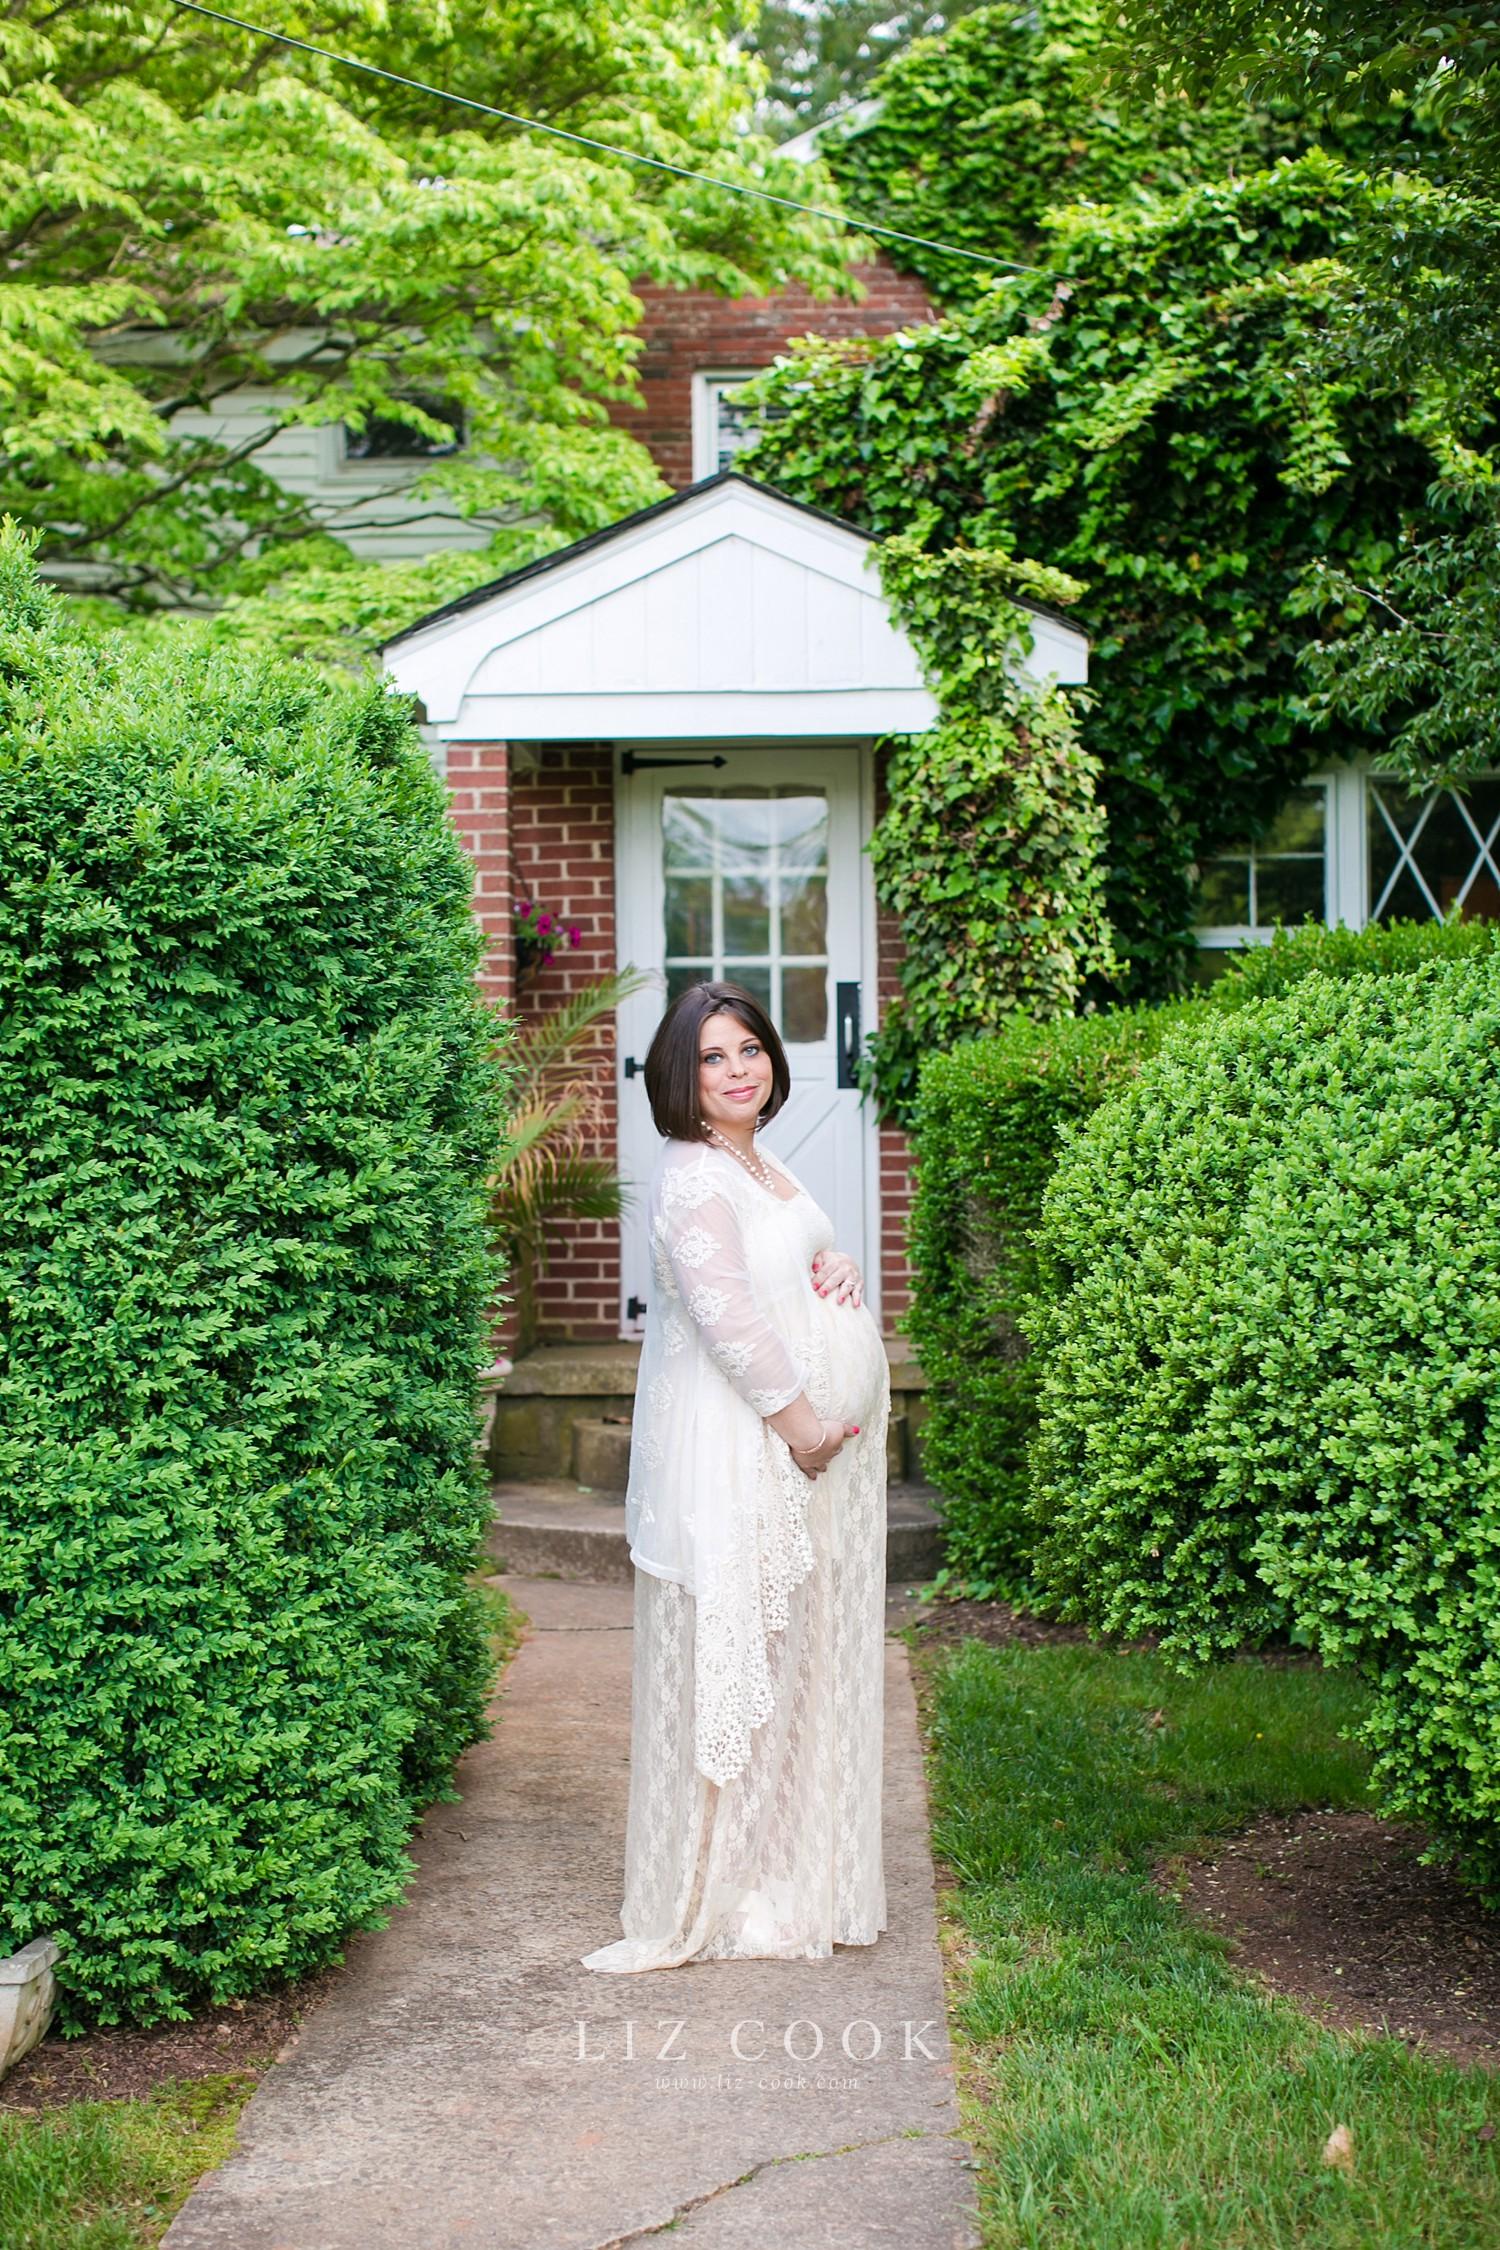 lynchburg-maternity-photographer_0006.jpg